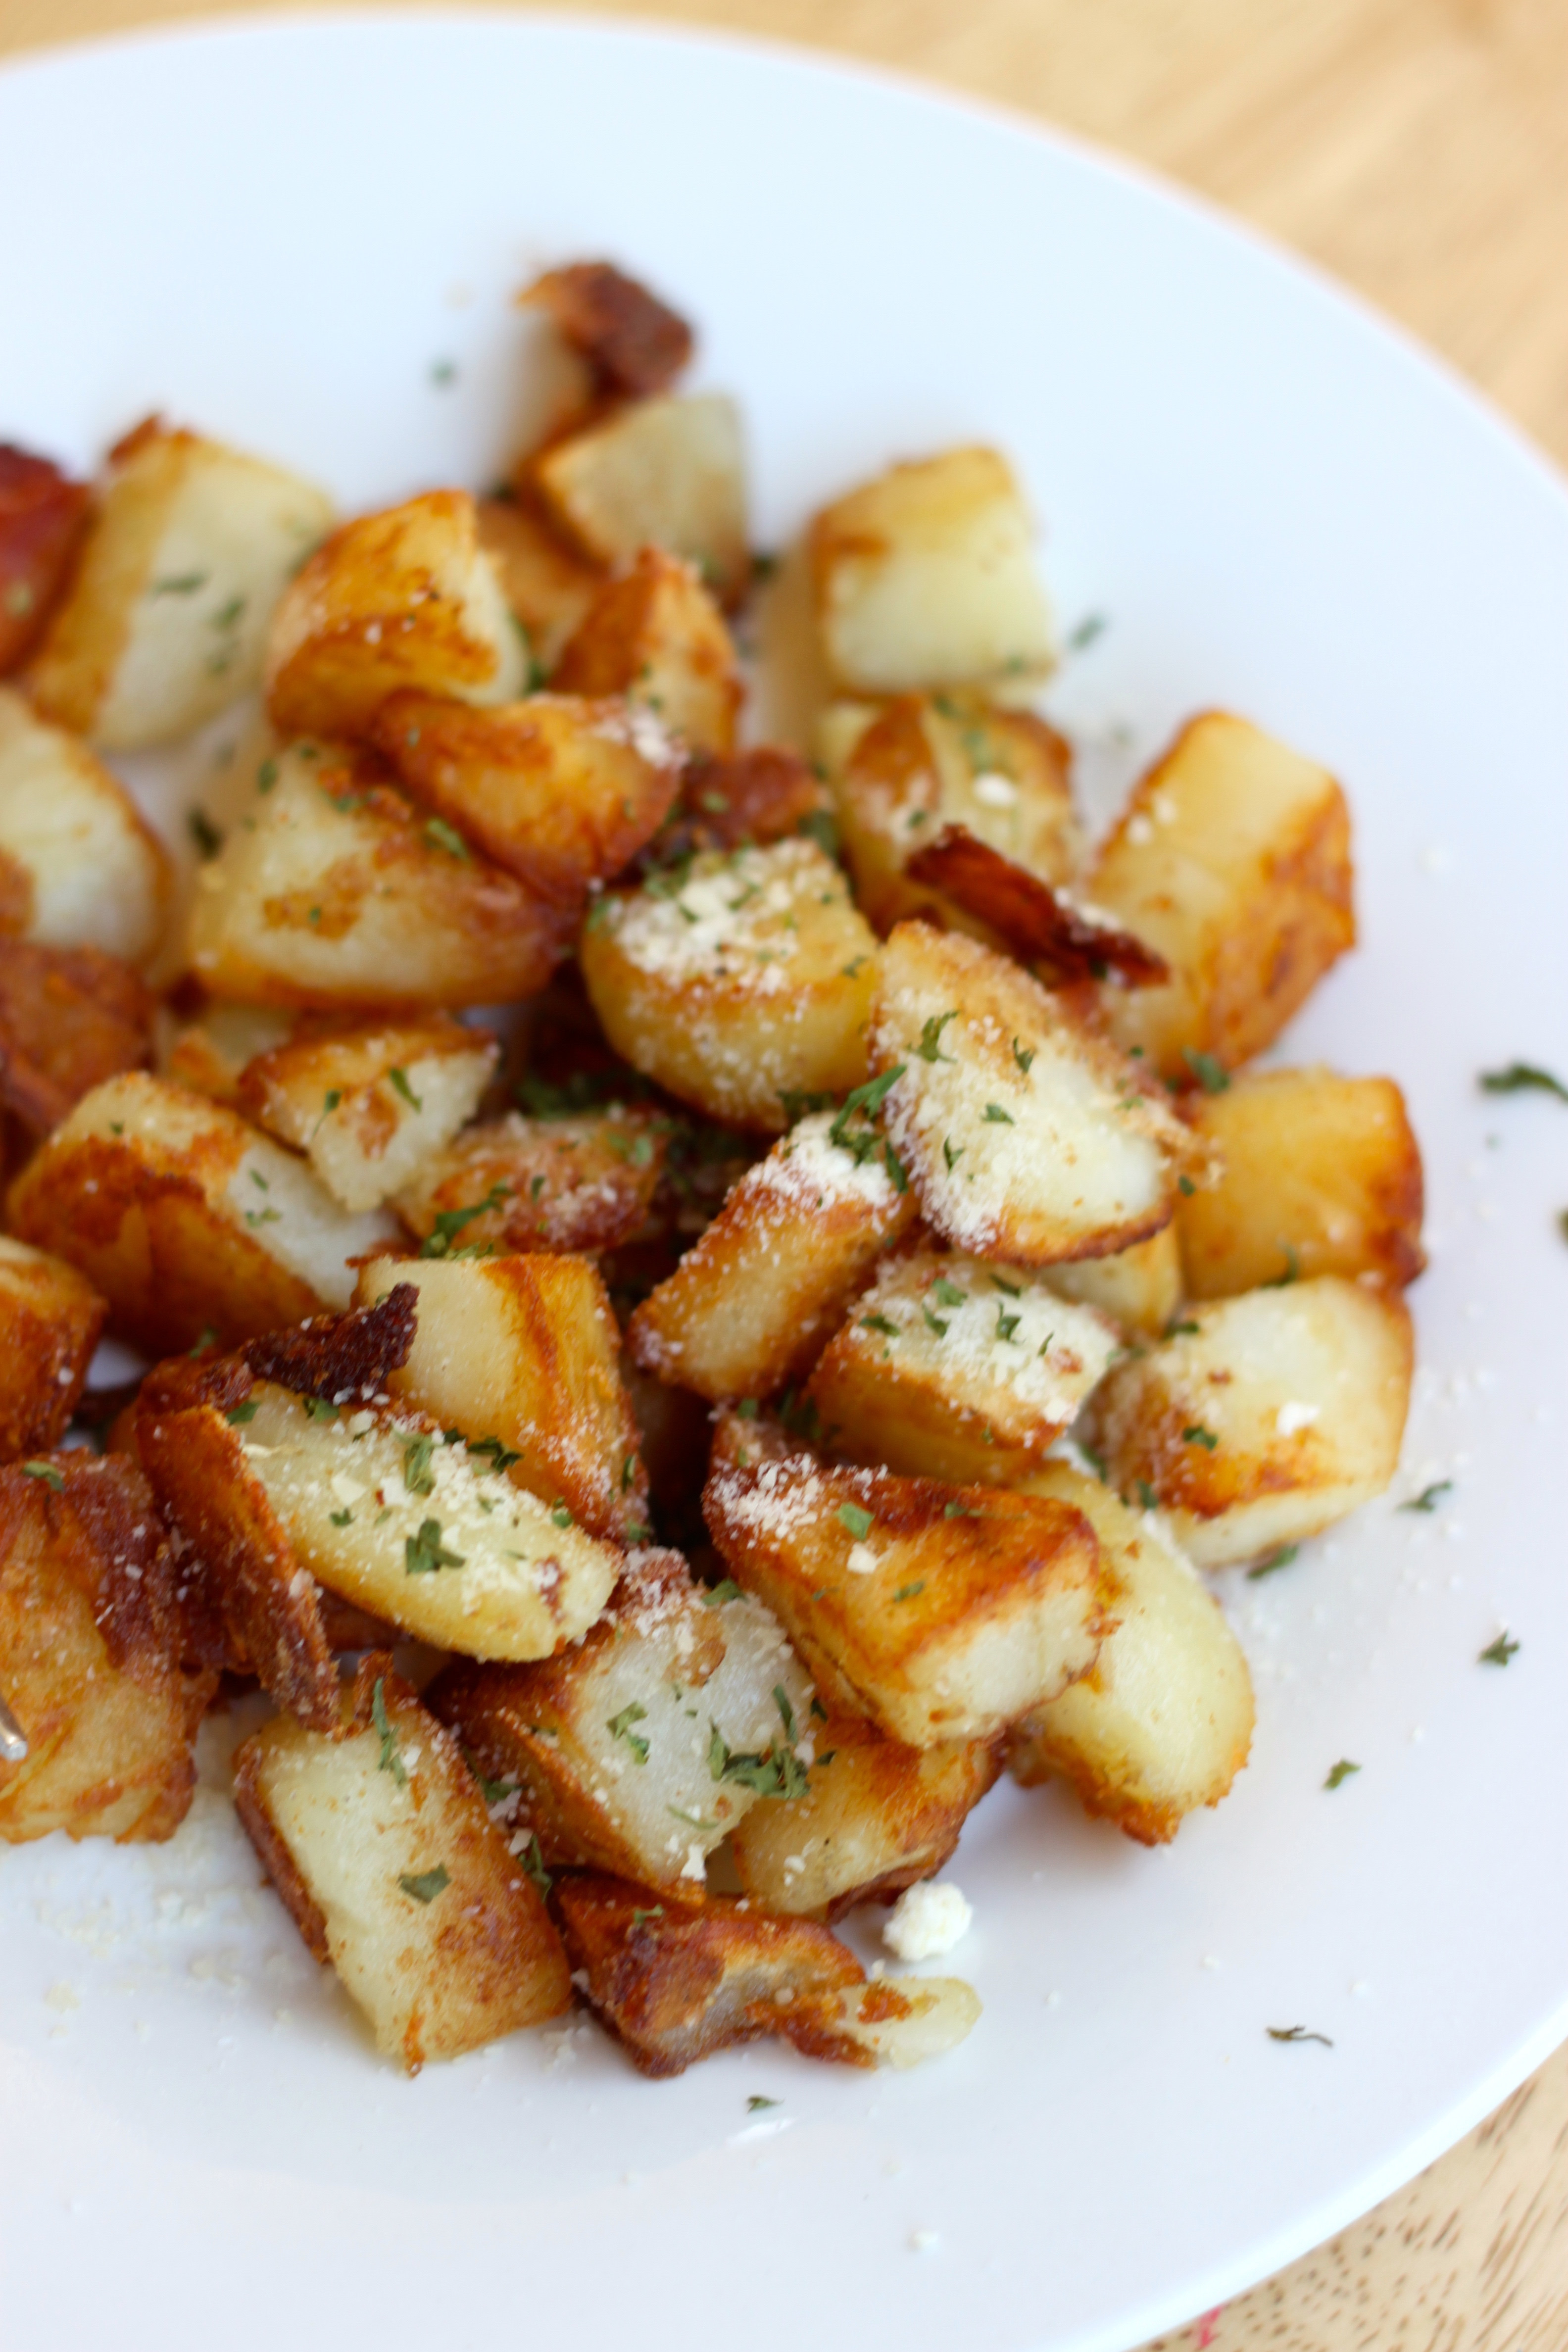 Potatoes Recipe For Breakfast  The Best Pan Fried Breakfast Potatoes – The Foo Patootie